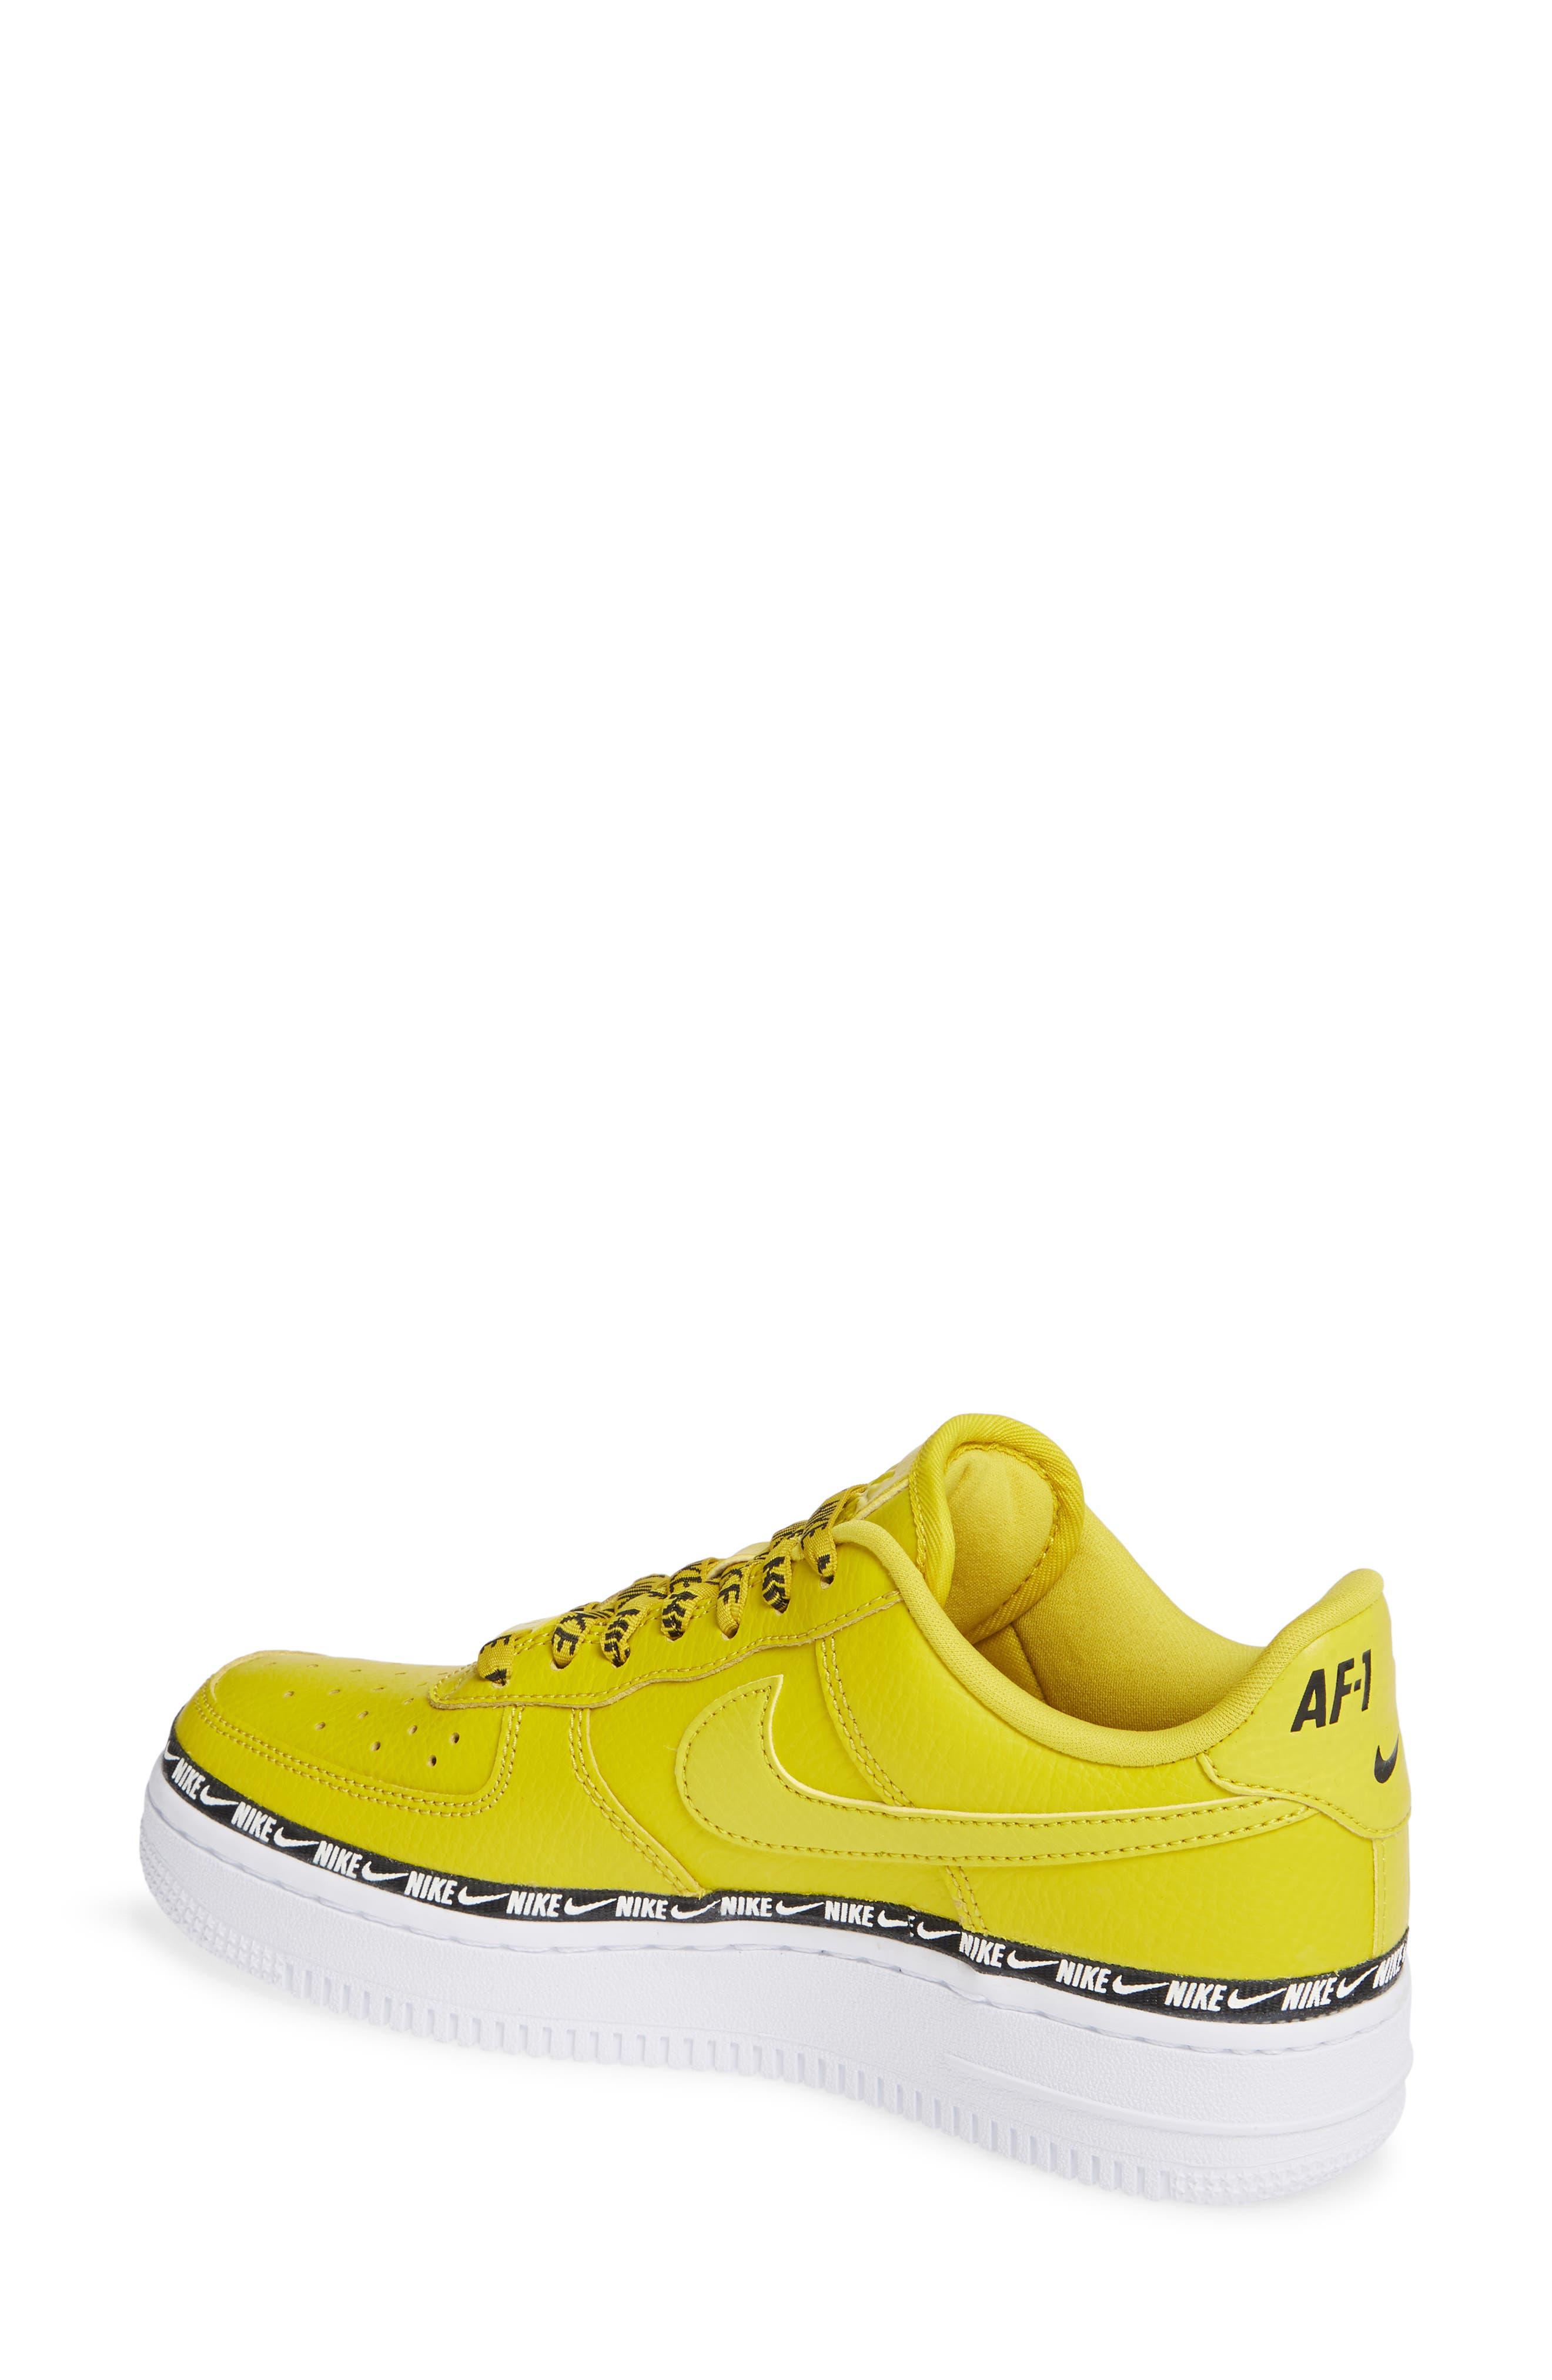 Air Force 1 '07 SE Premium Sneaker,                             Alternate thumbnail 2, color,                             BRIGHT CITRON/ BLACK/ WHITE